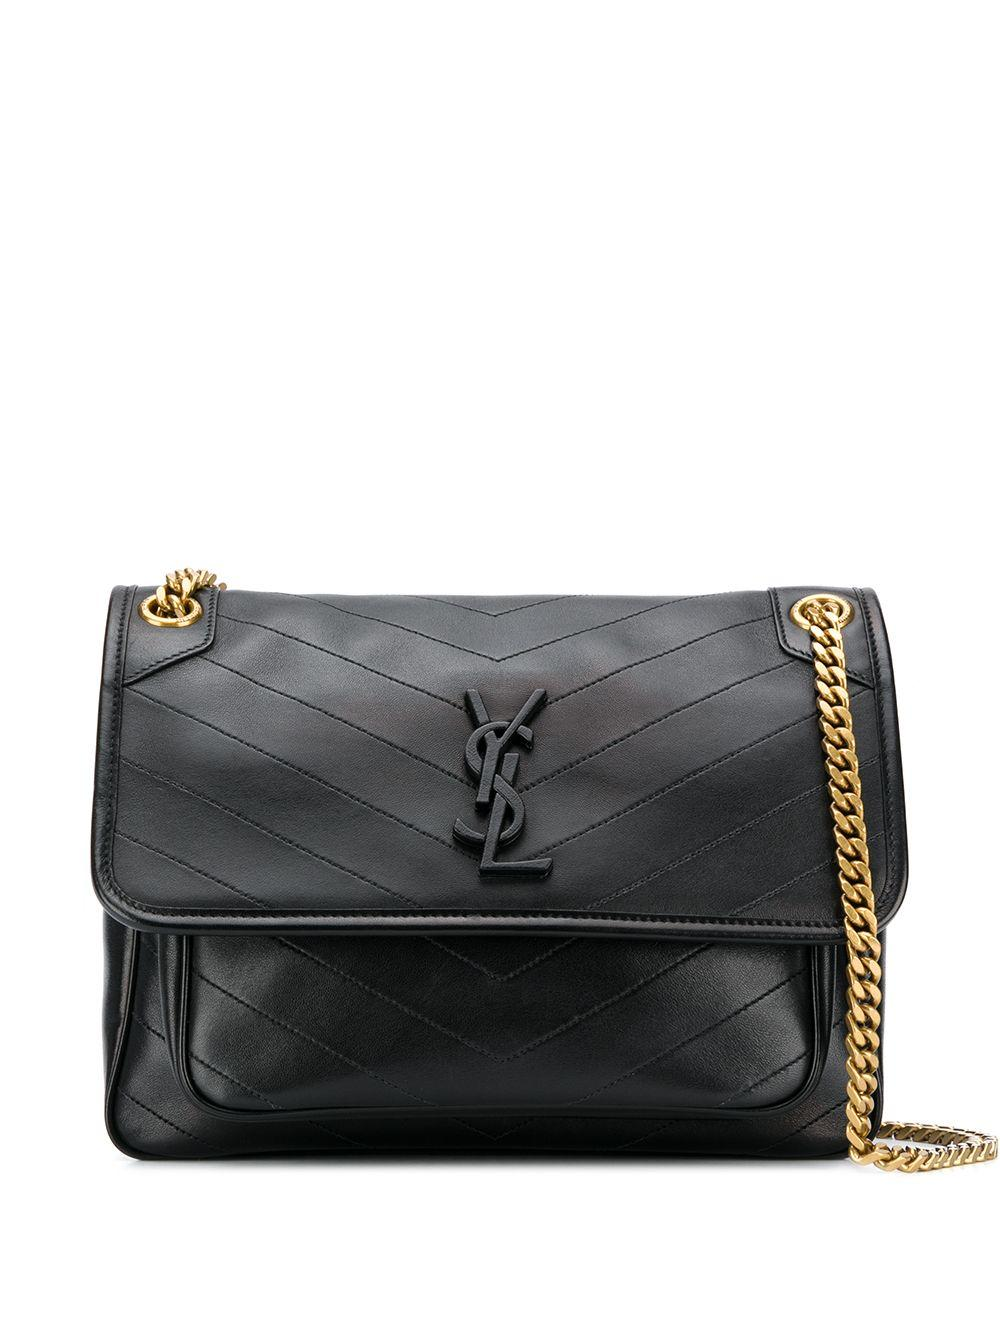 Medium Niki Shoulder Bag